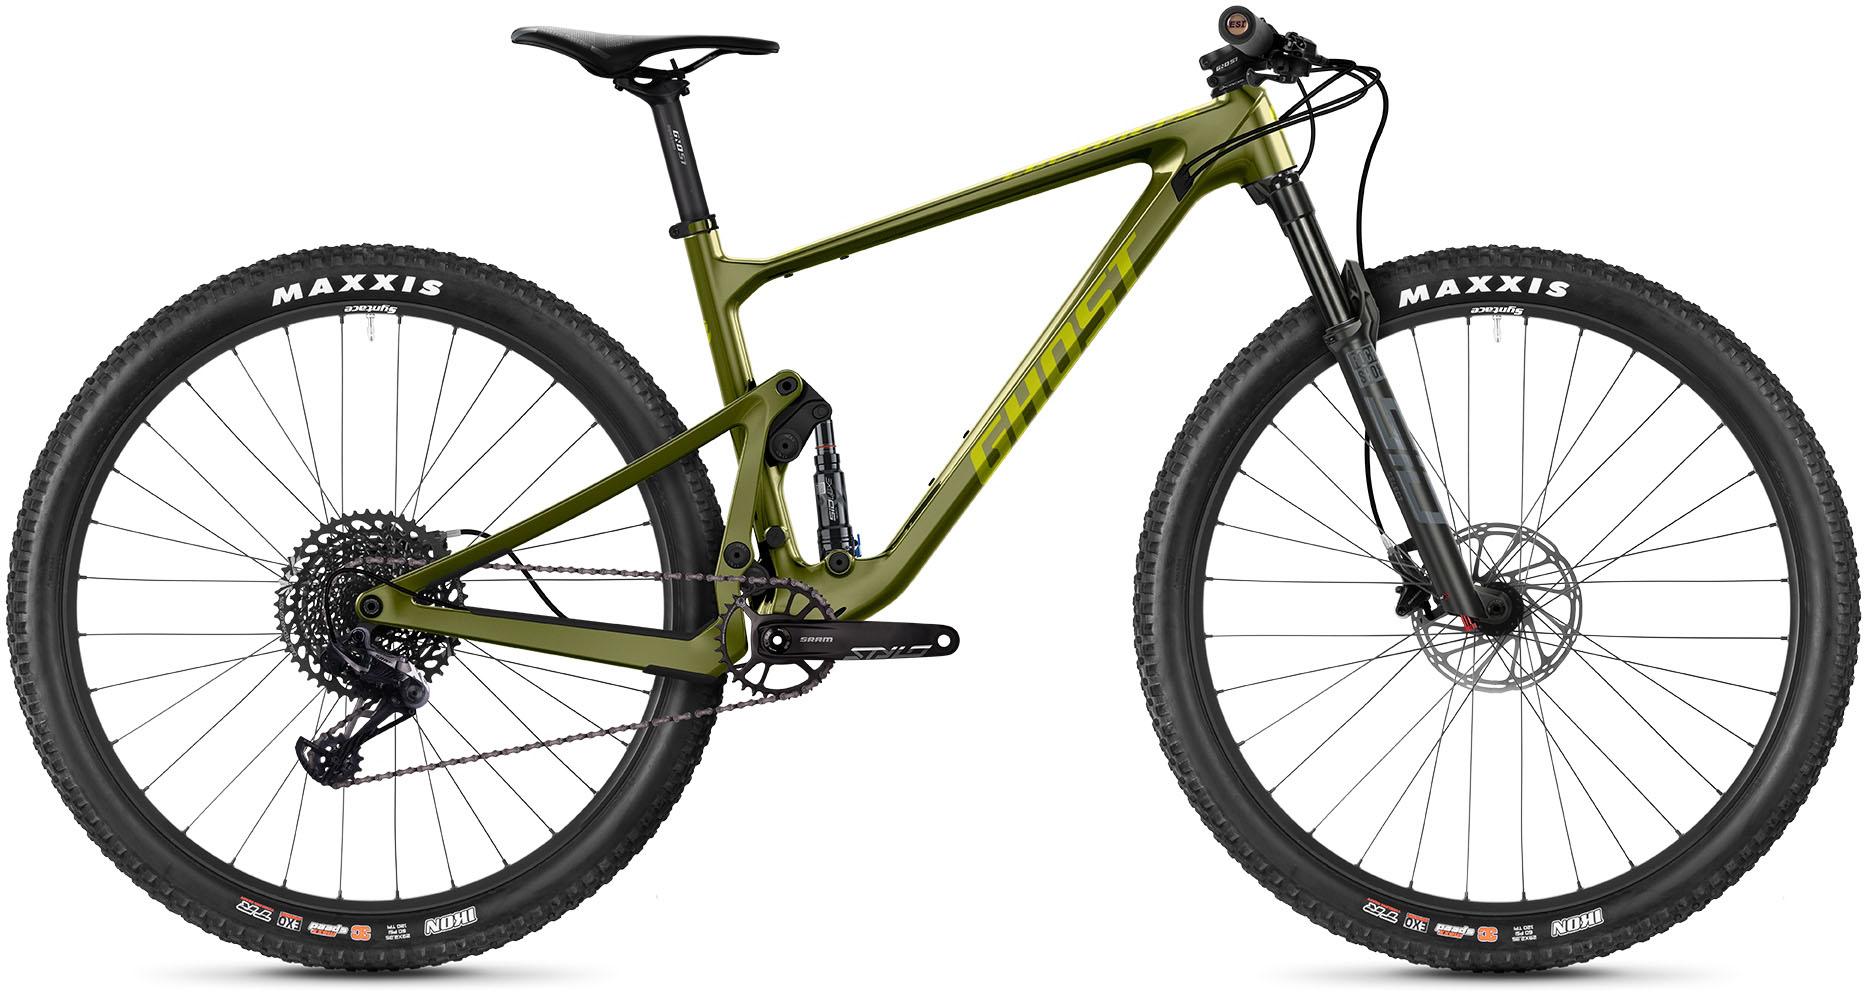 ghost mountainbike lector fs sf lc u universal 12 gang sram xo1 eagle schaltwerk kettenschaltung - Specialized Levo SL S-Works Carbon 2020 , Specialized